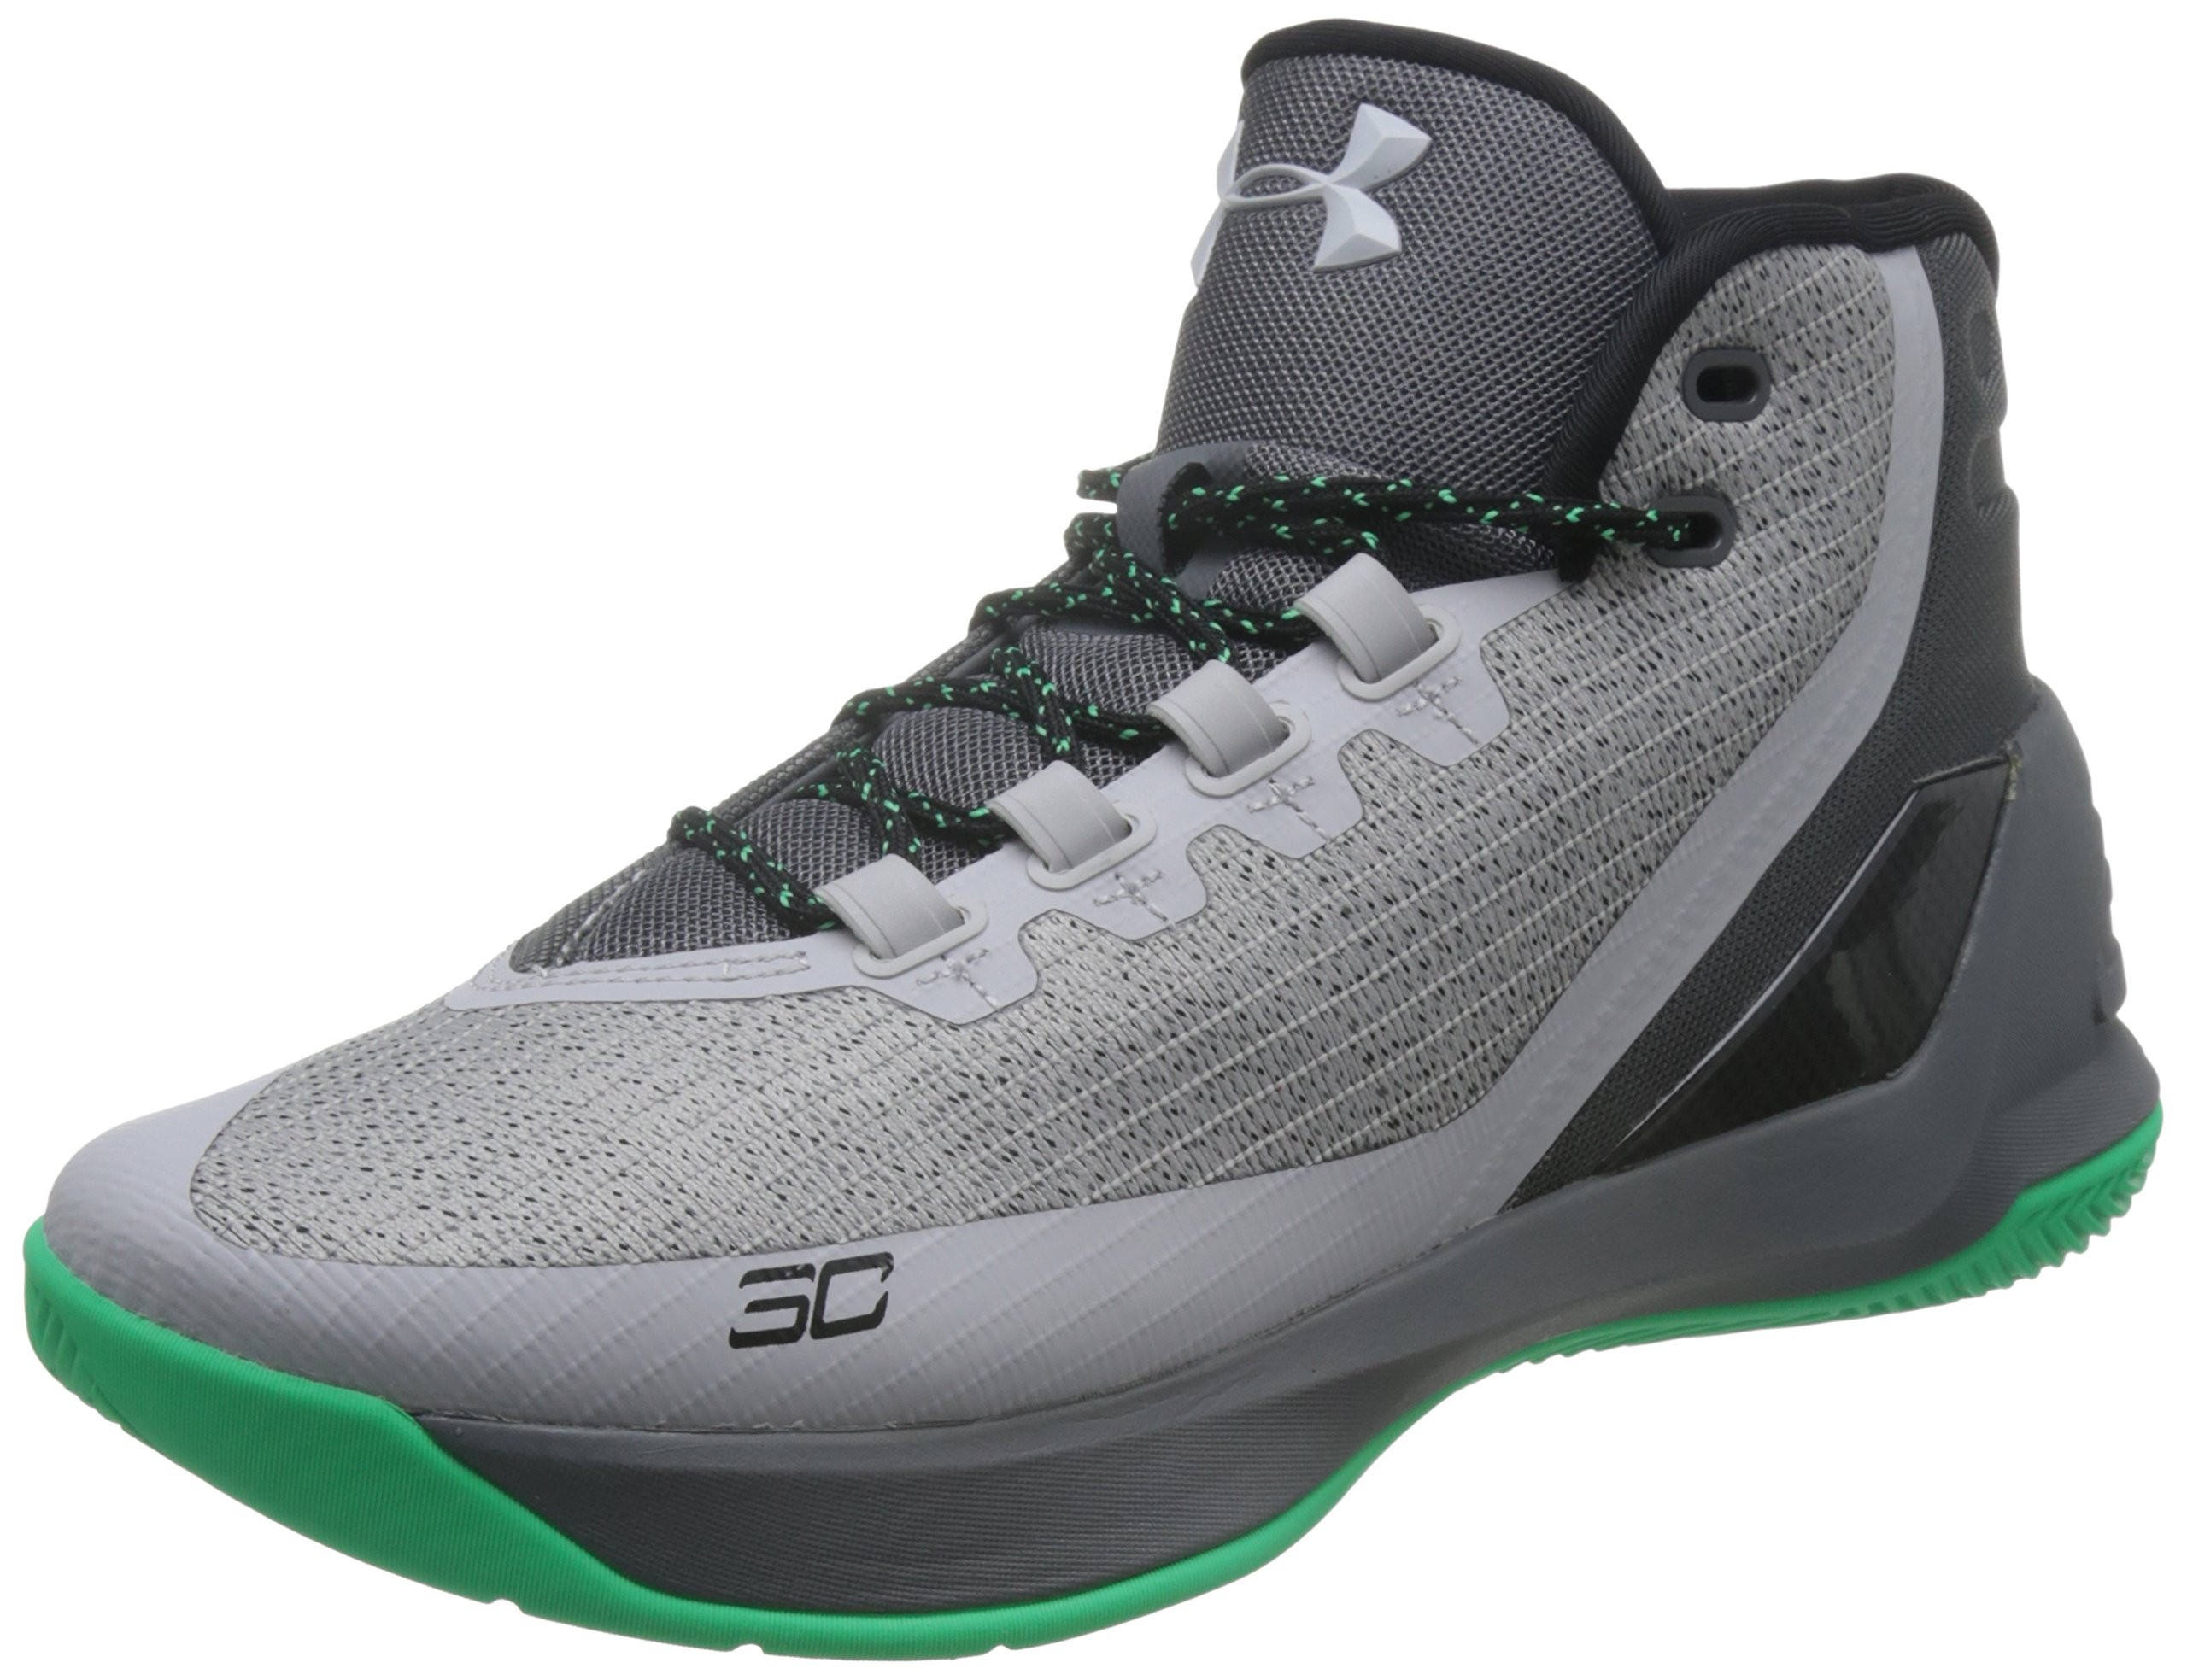 234230a5e86 Galleon - Under Armour Men s UA Curry 3 Basketball Shoes (Black Or Grey)  1269279 (13